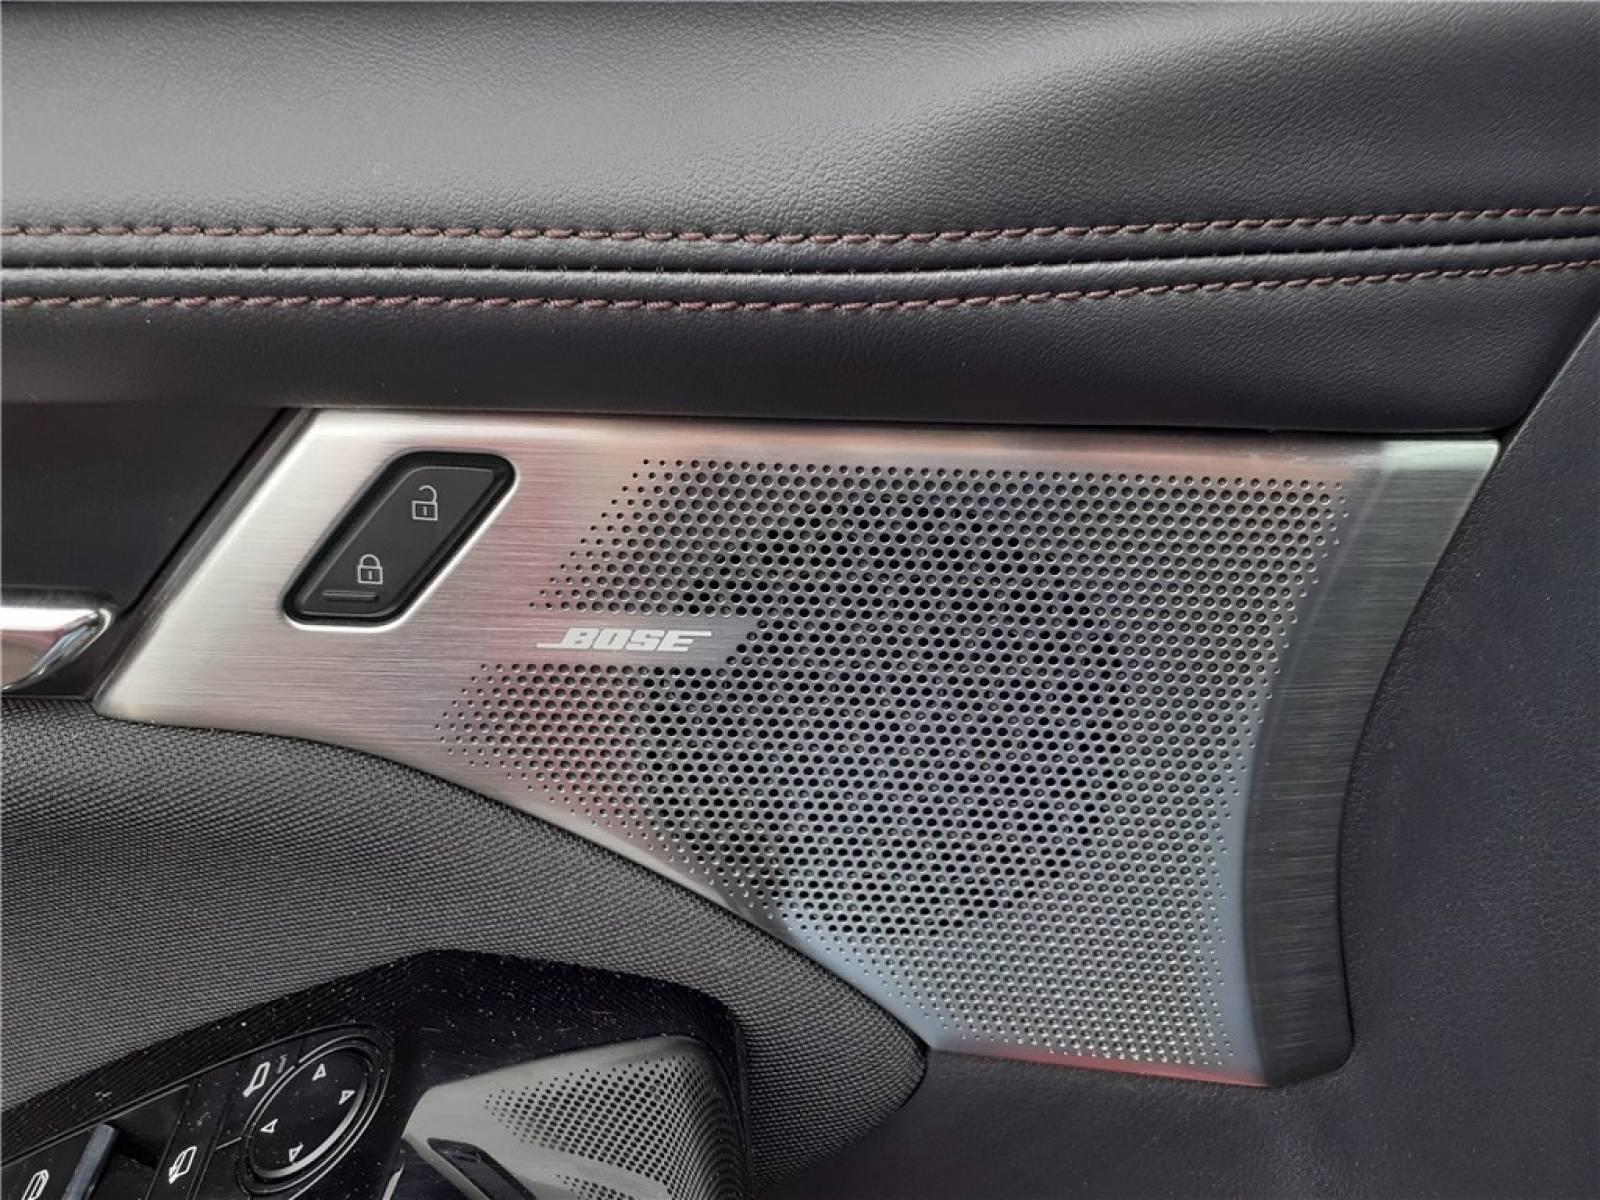 MAZDA Mazda3 5 portes 2.0L SKYACTIV-G M Hybrid 122 ch BVA6 - véhicule d'occasion - Groupe Guillet - Chalon Automobiles - 71100 - Chalon-sur-Saône - 39